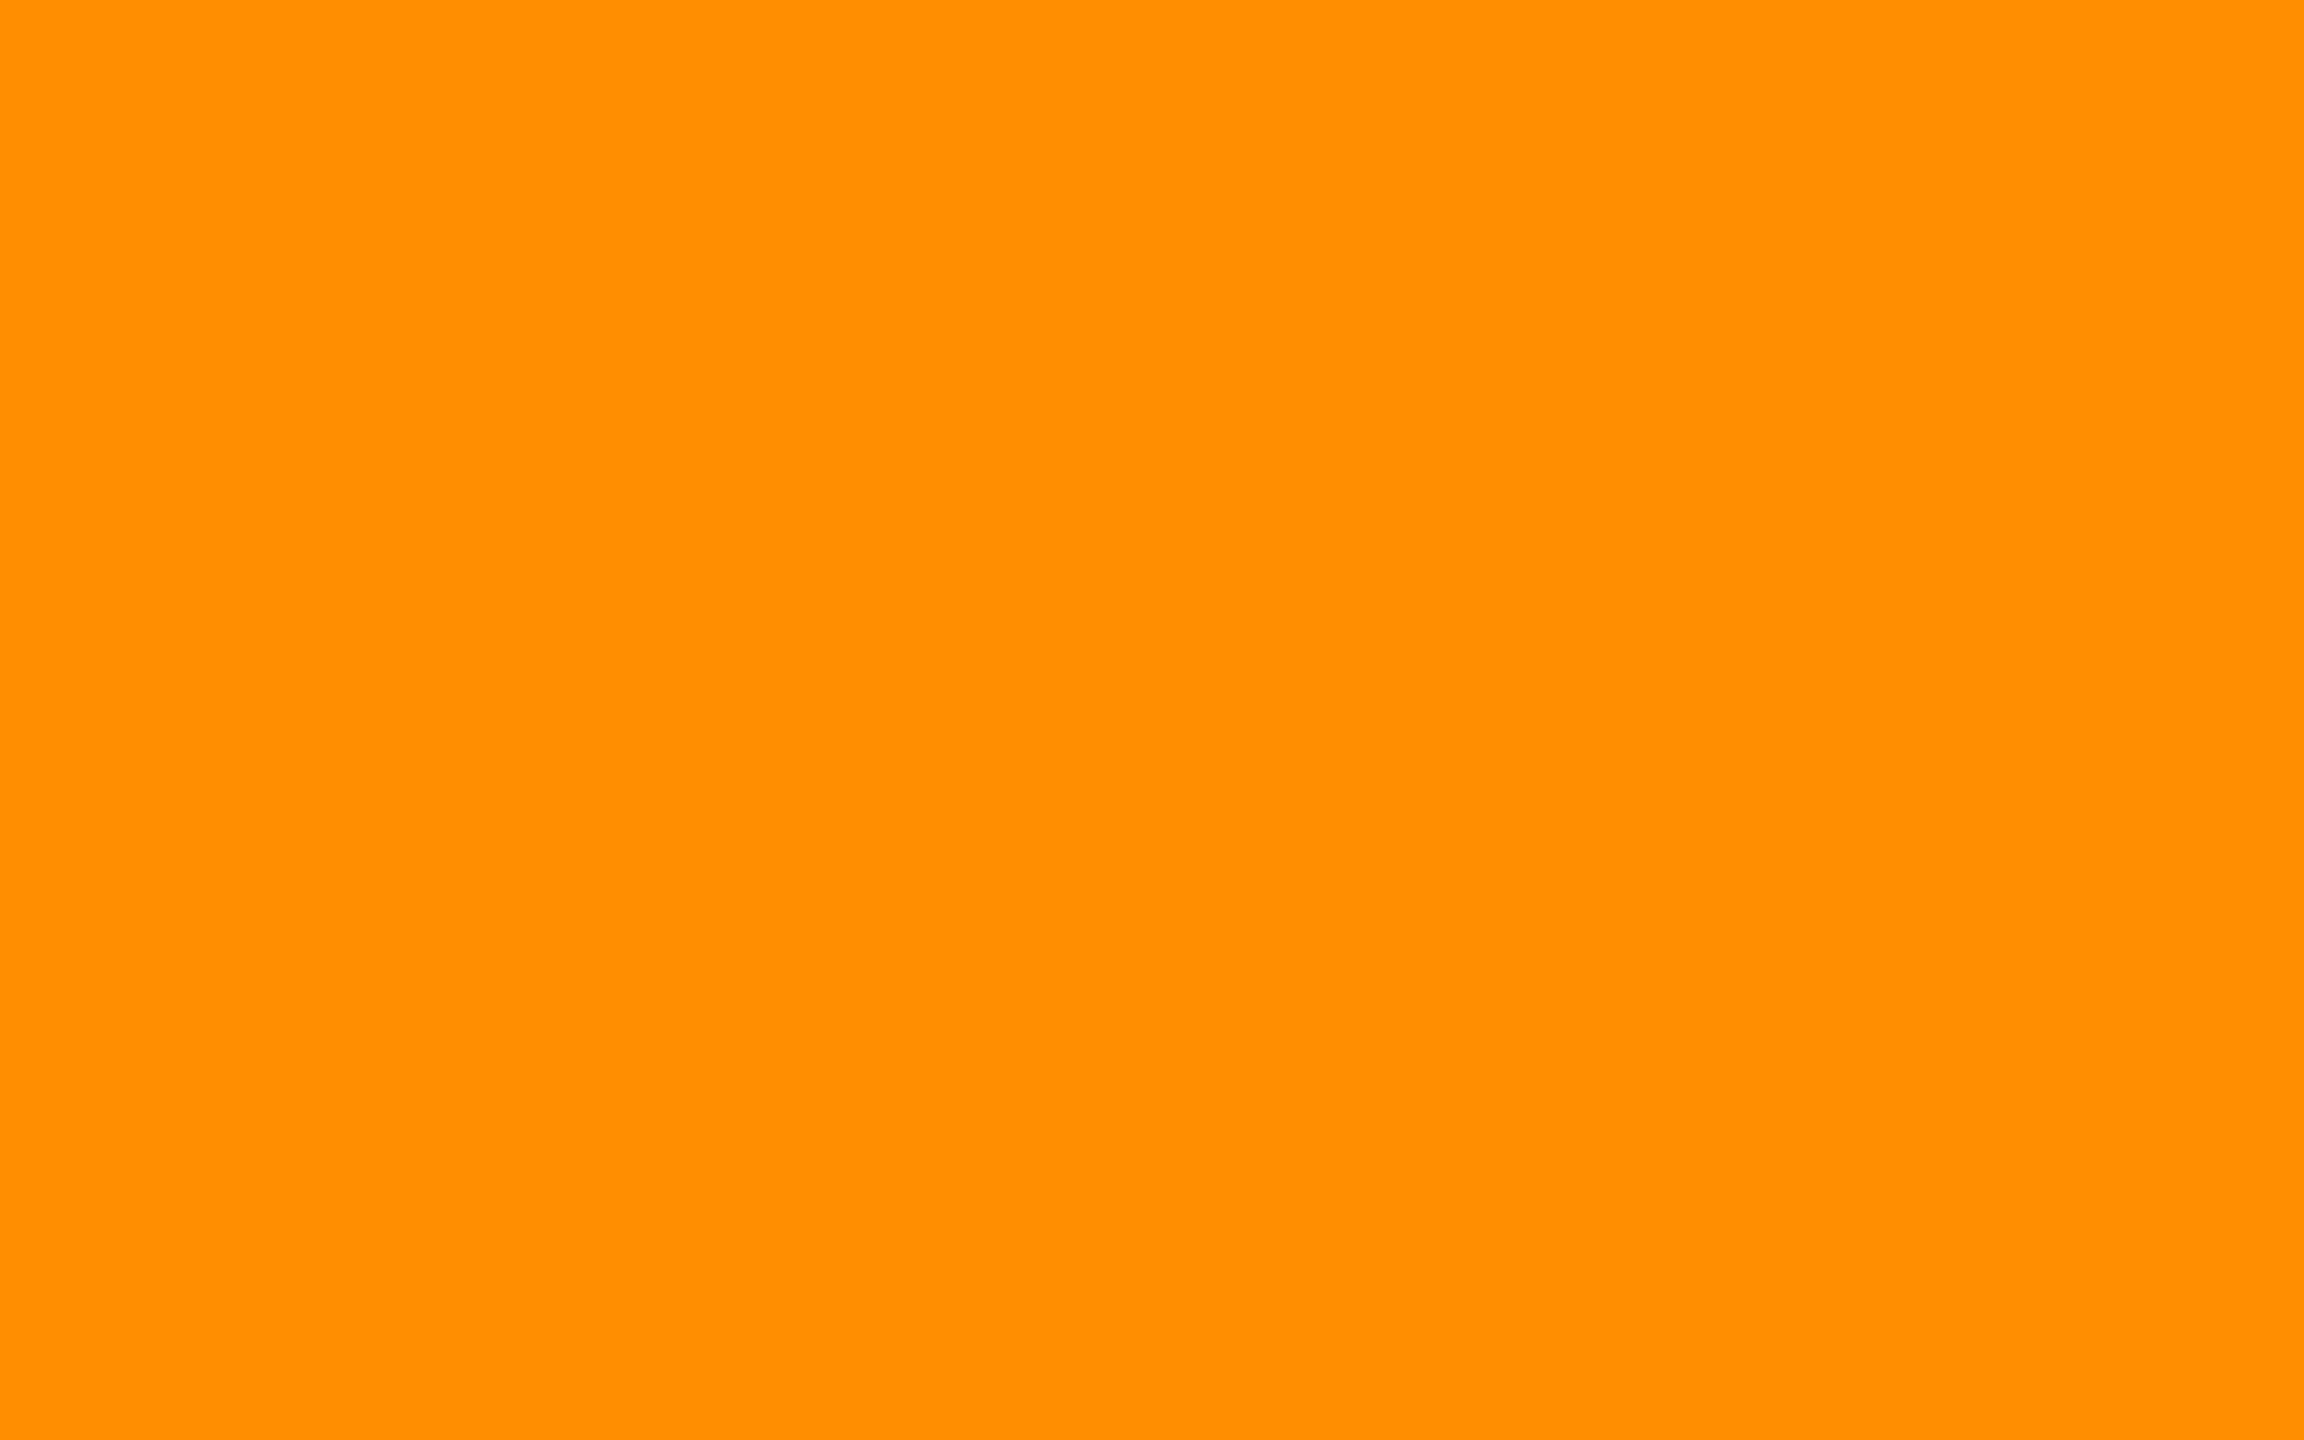 2304x1440 Princeton Orange Solid Color Background